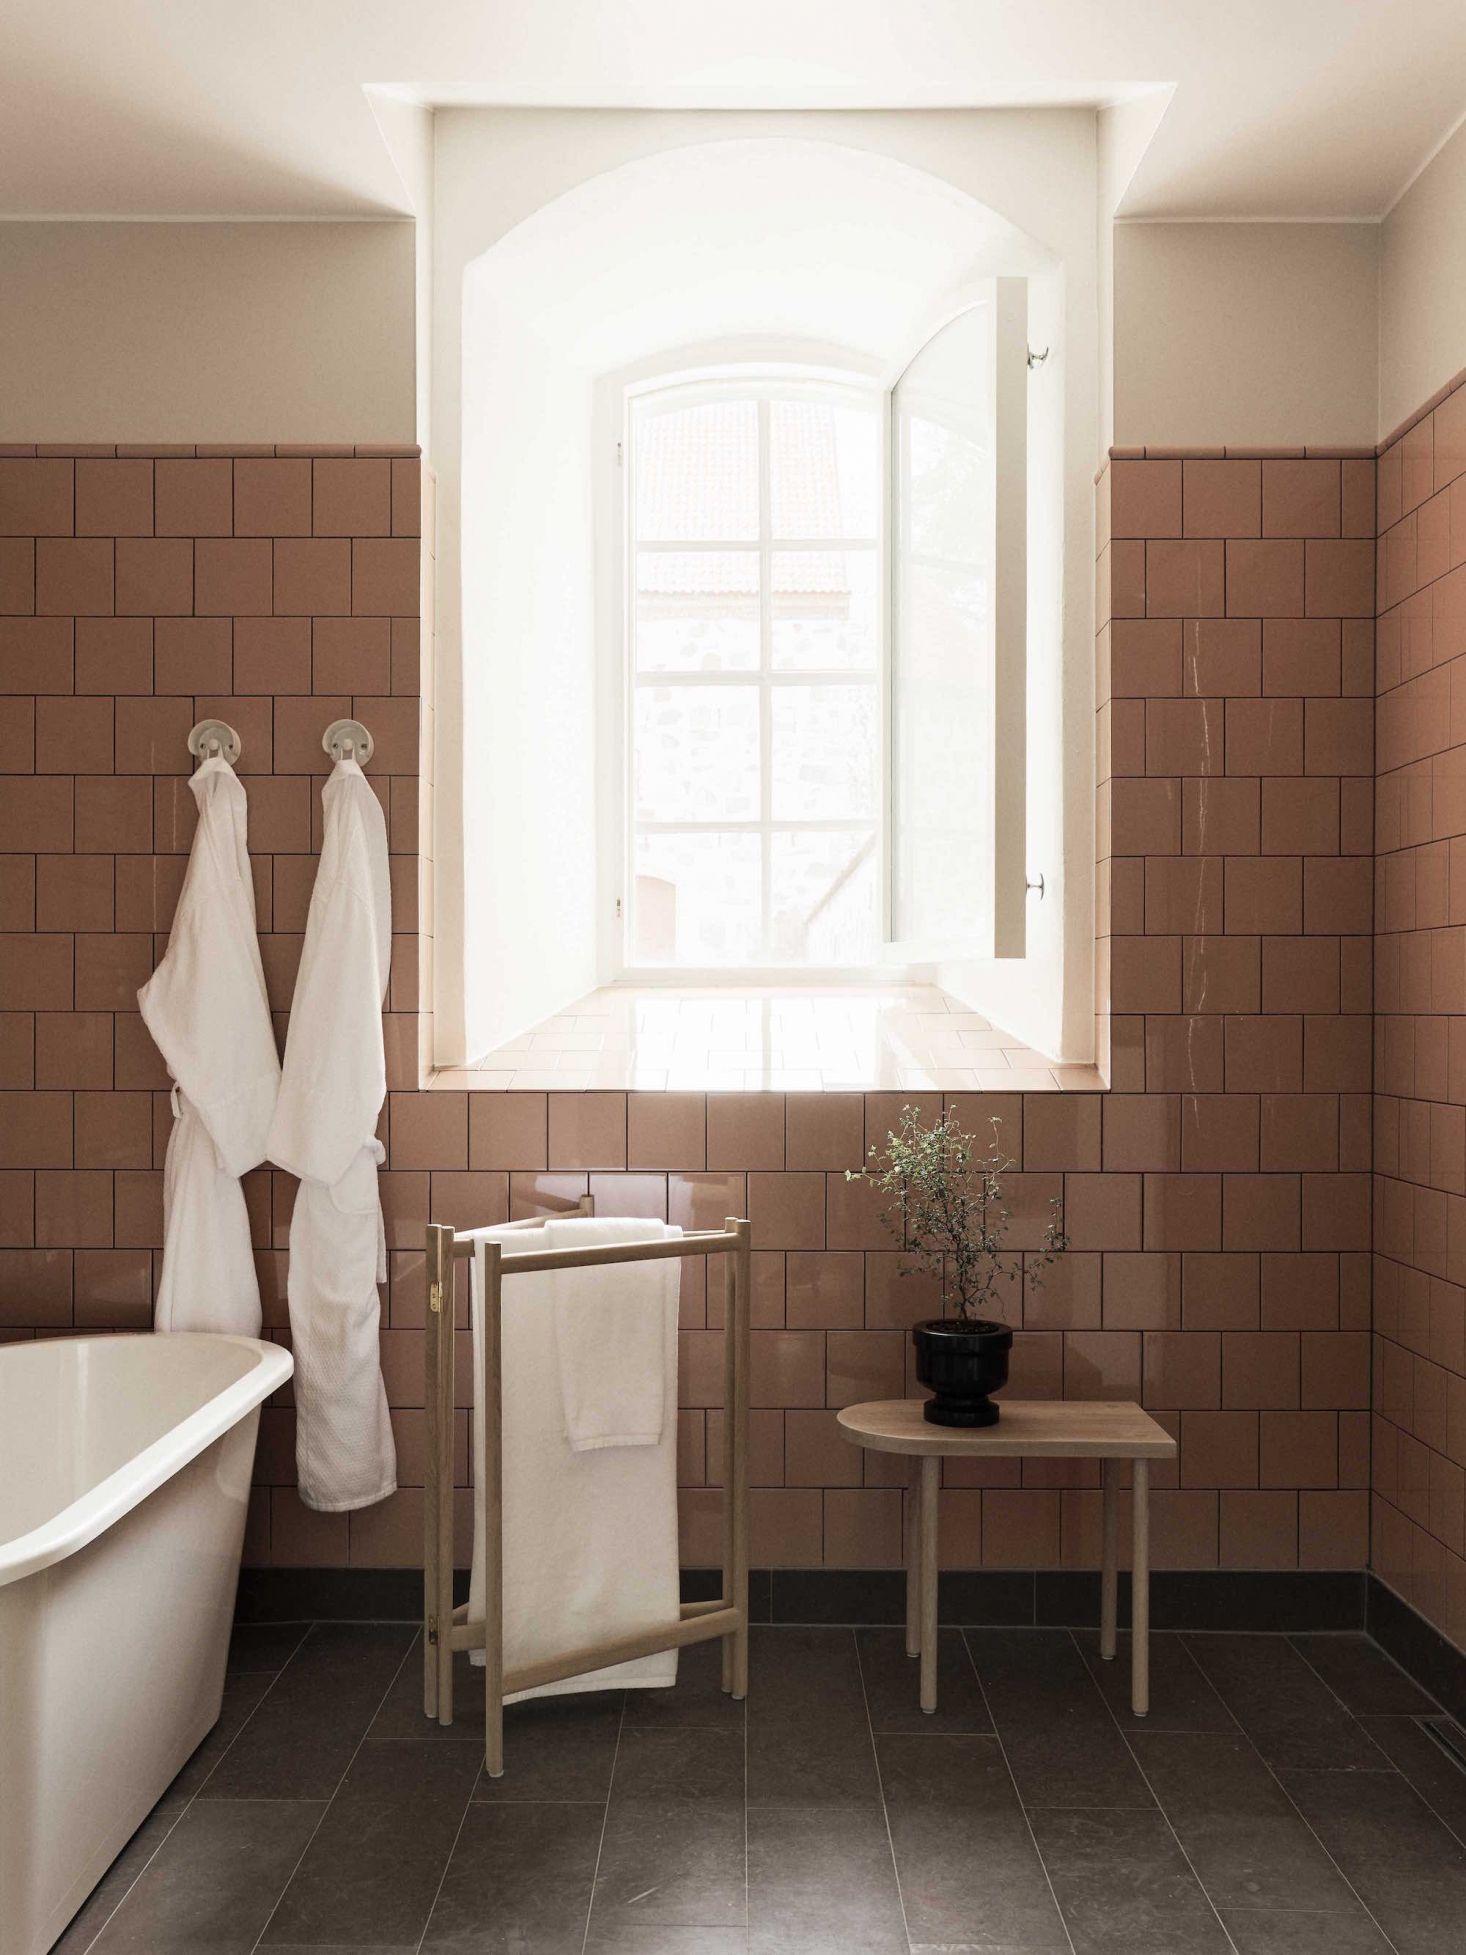 new directions 18 design trends for 2018 inspire bathrooms rh pinterest com